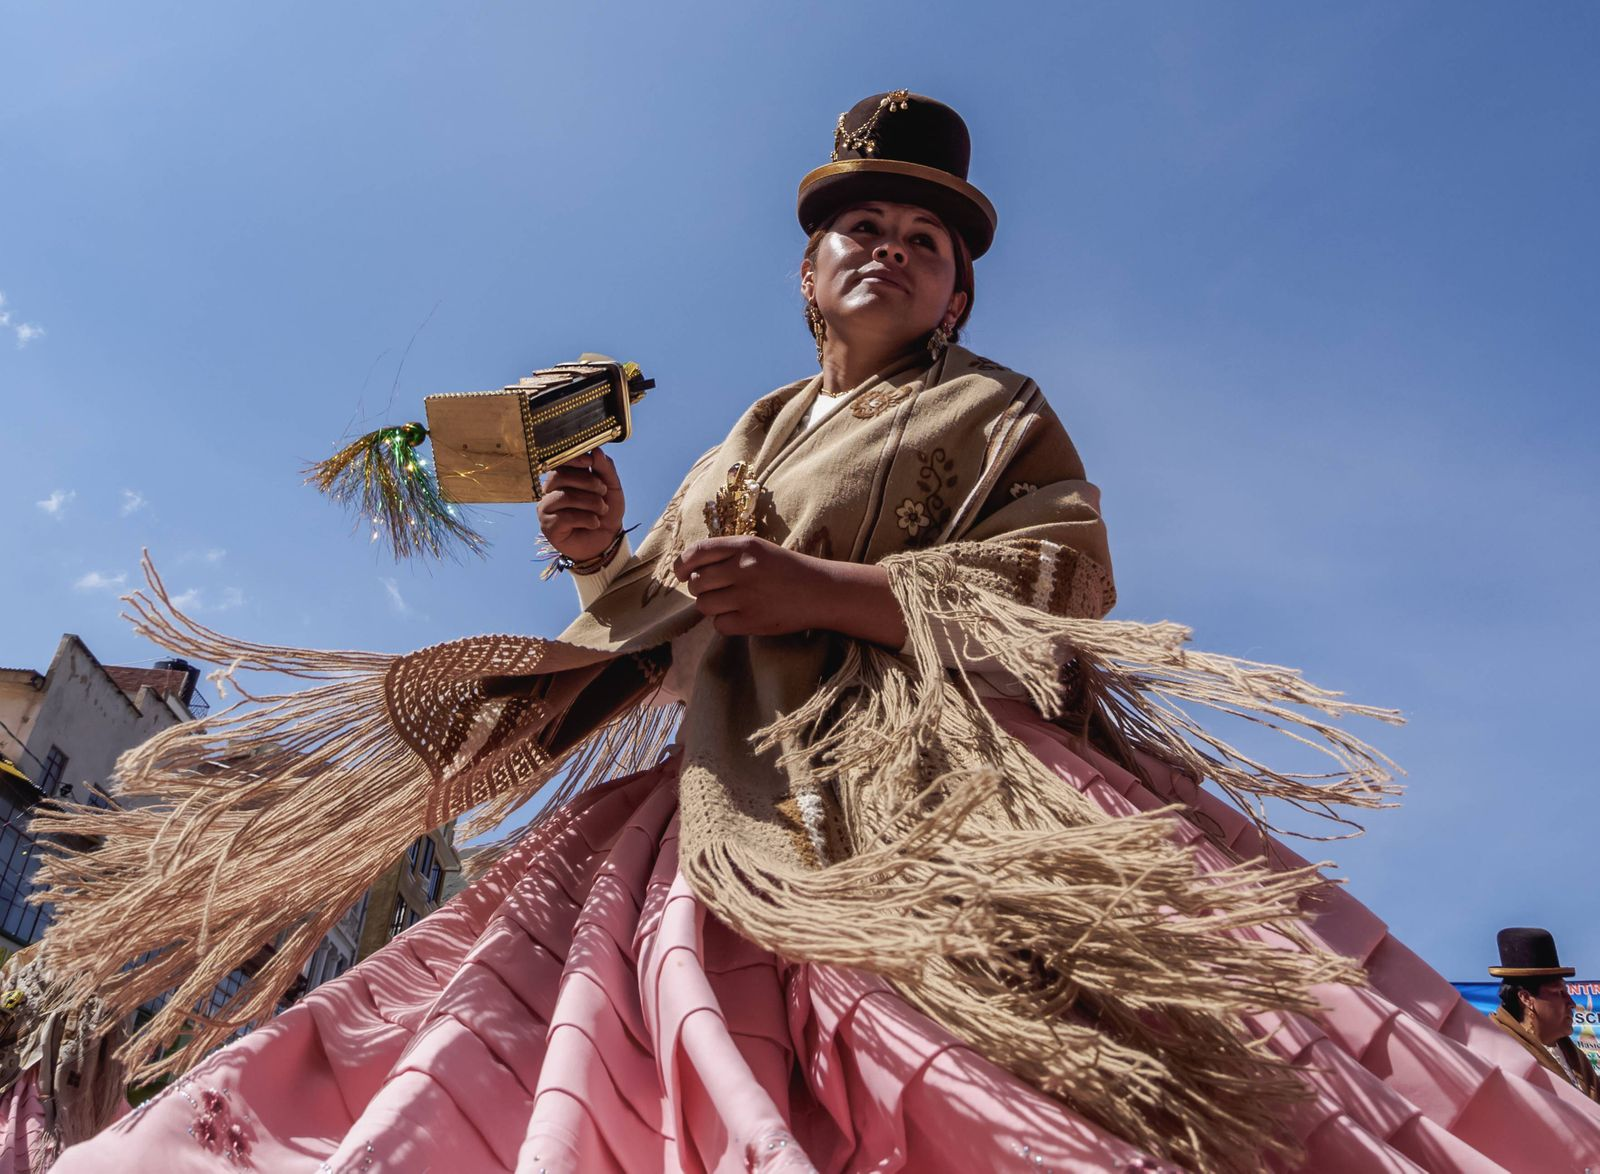 Dancer in traditional costume Fiesta de la Virgen de la Candelaria Copacabana La Paz Department